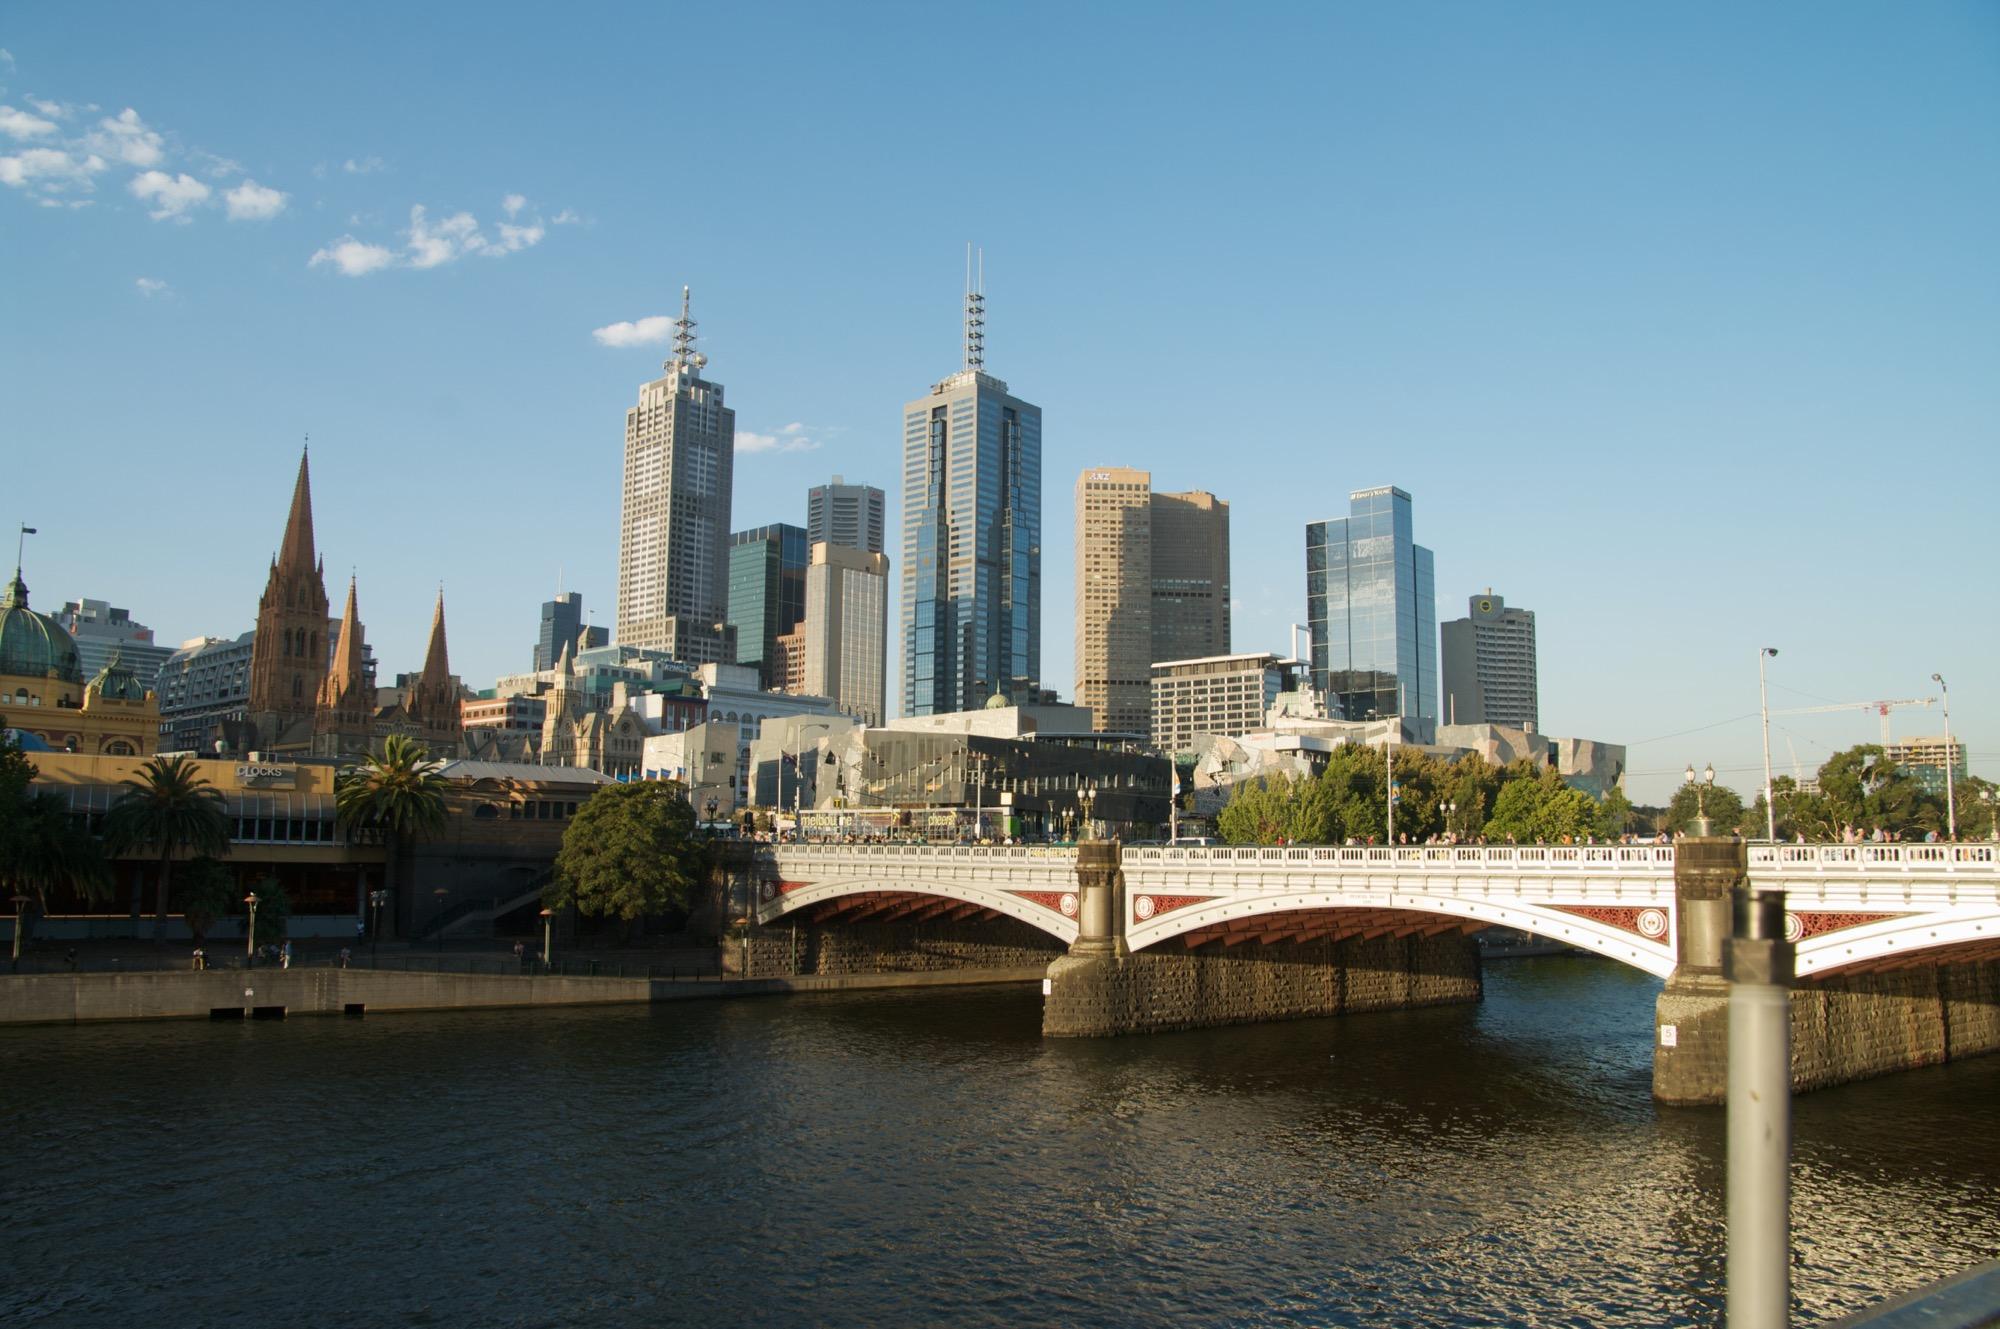 Melbourne stuff - 1 of 223 (205).jpg